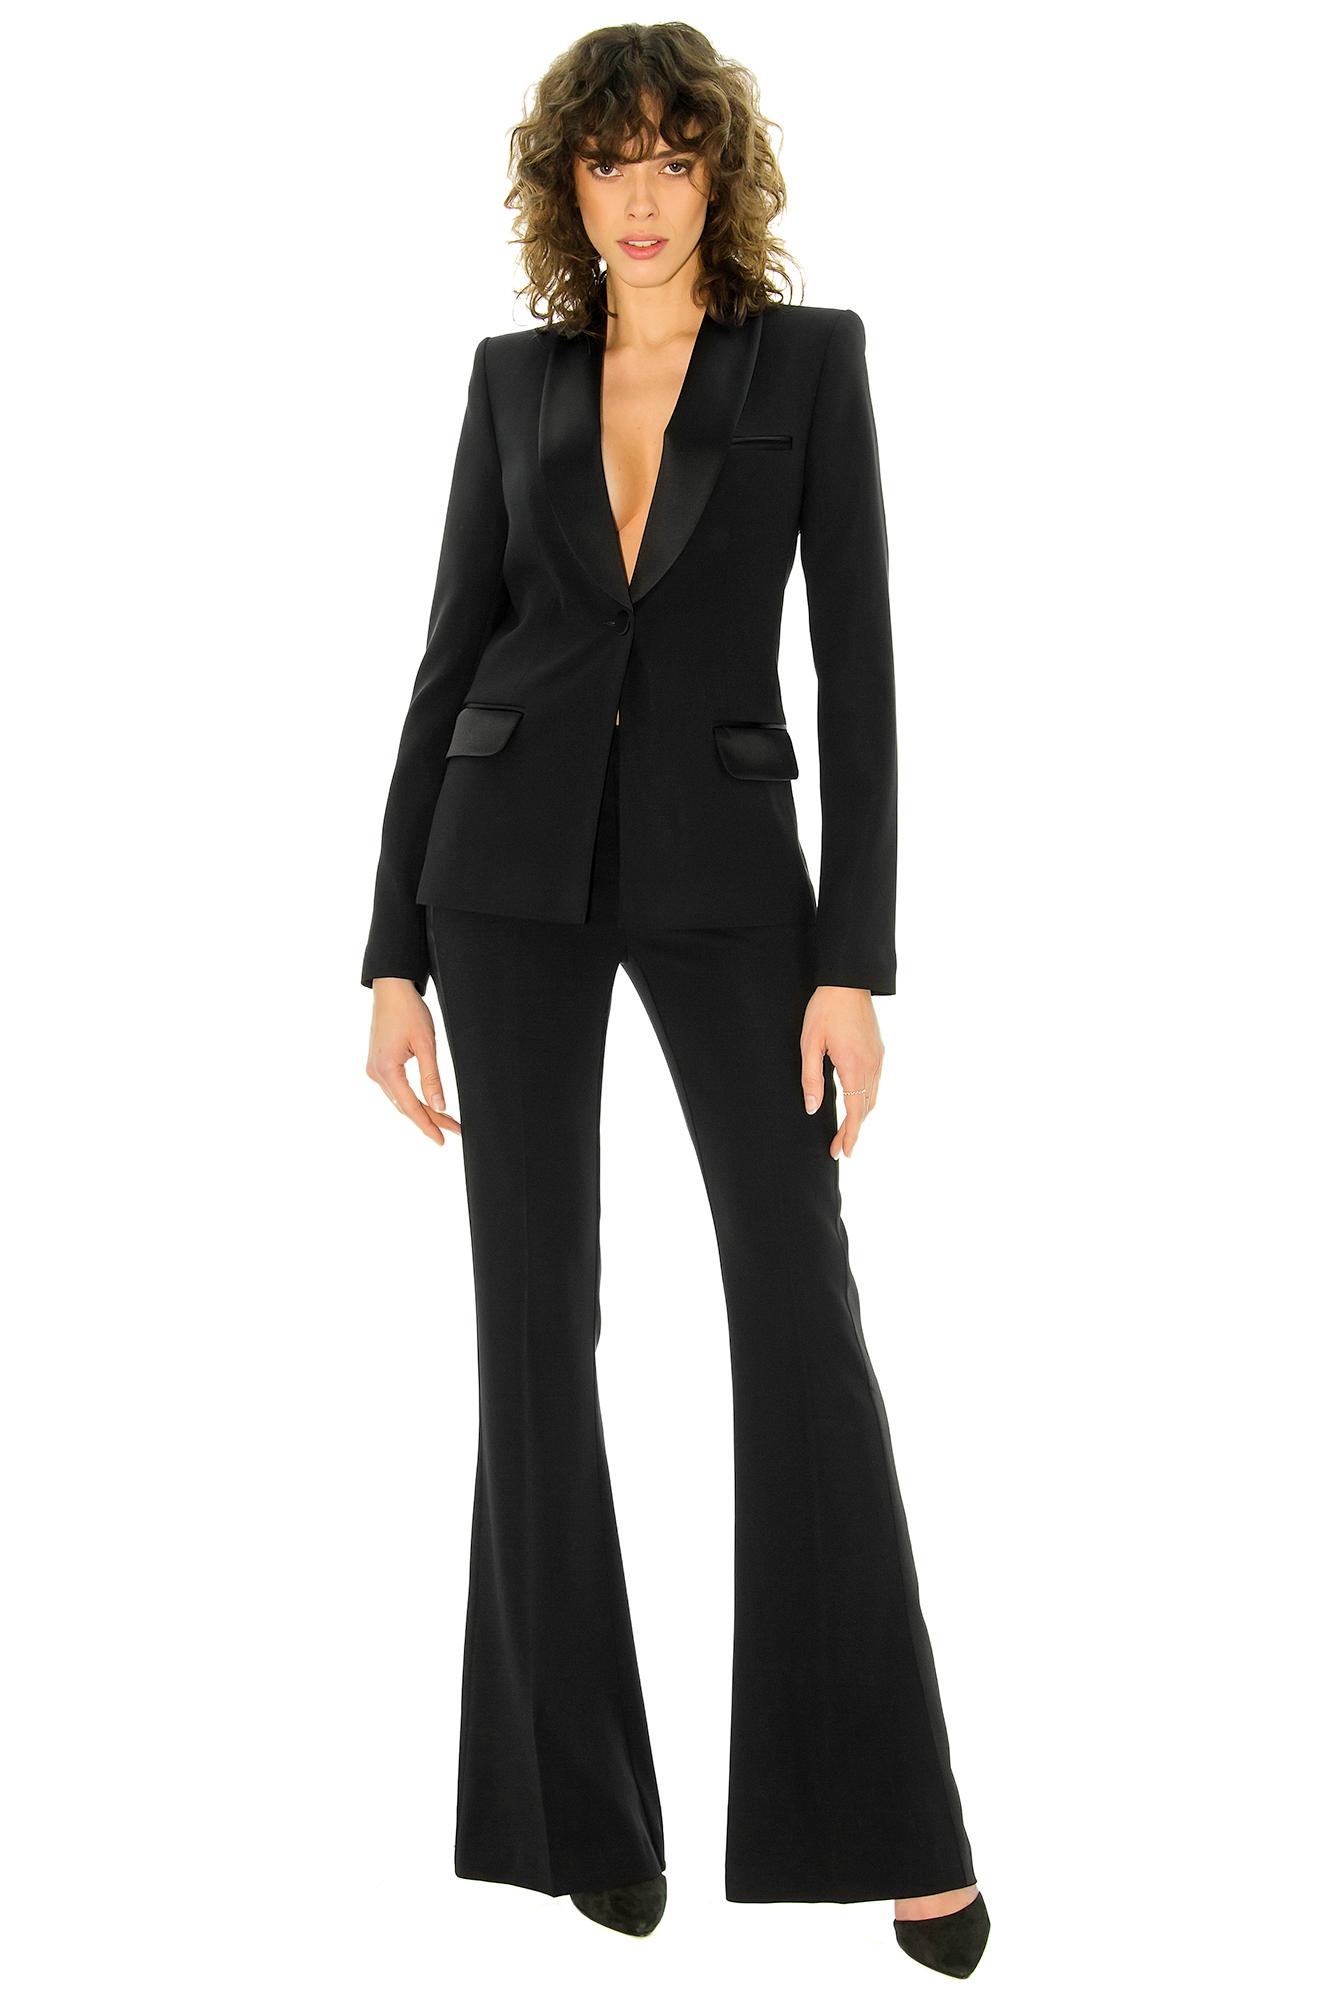 d5fe4febc323cc tuxedo jacket, woman tuxedo, renoma jacket, renoma stefanie ...